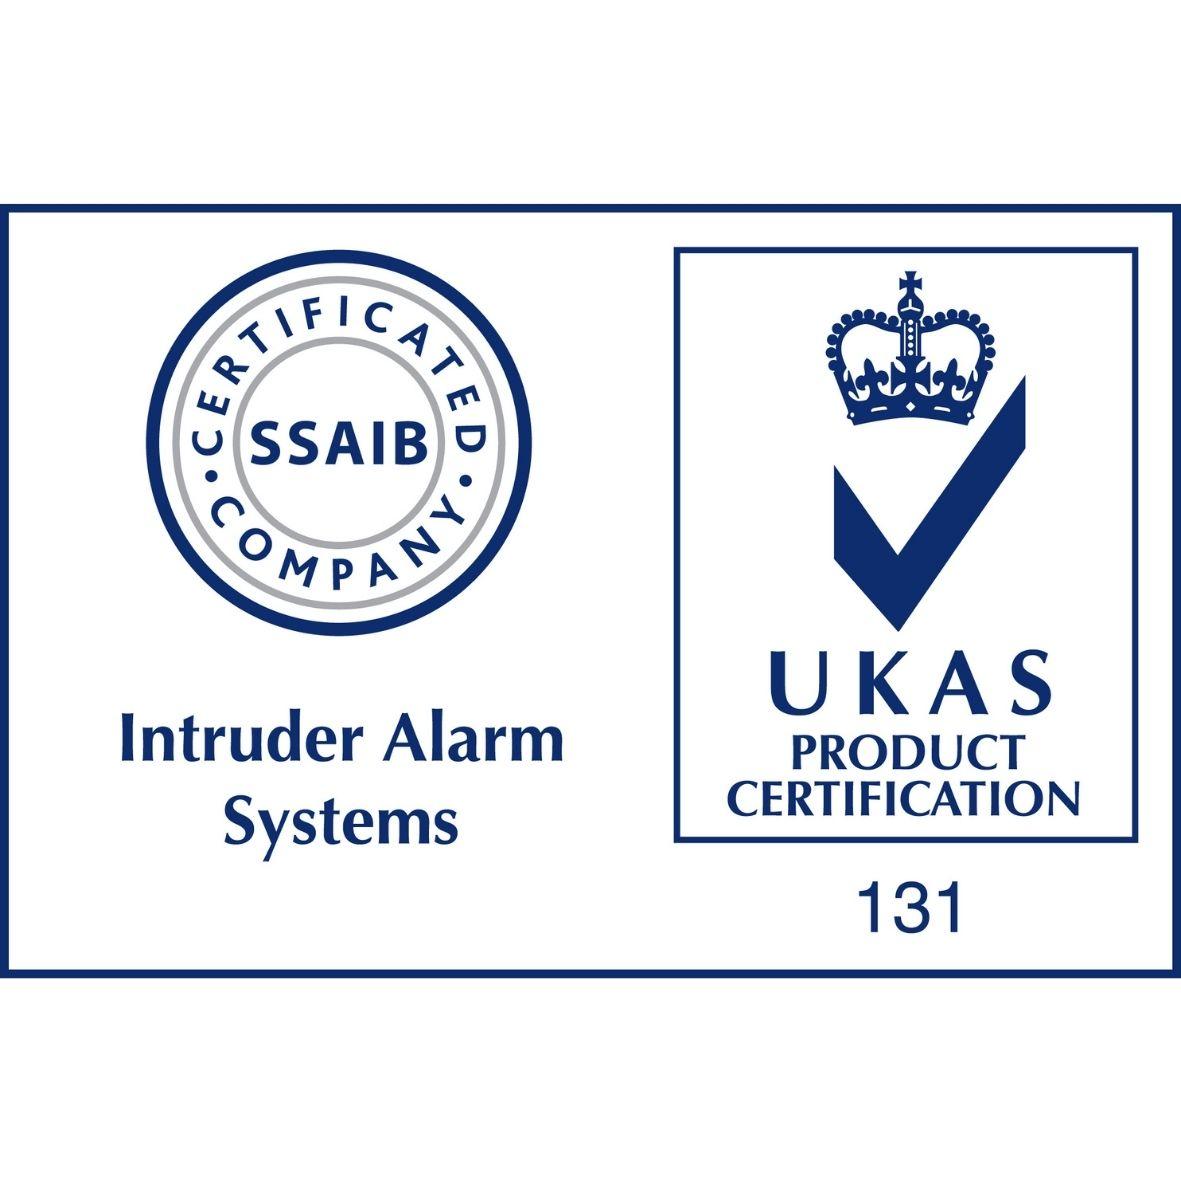 SSAIB Intruder Alarm with UKAS Accreditation Logo